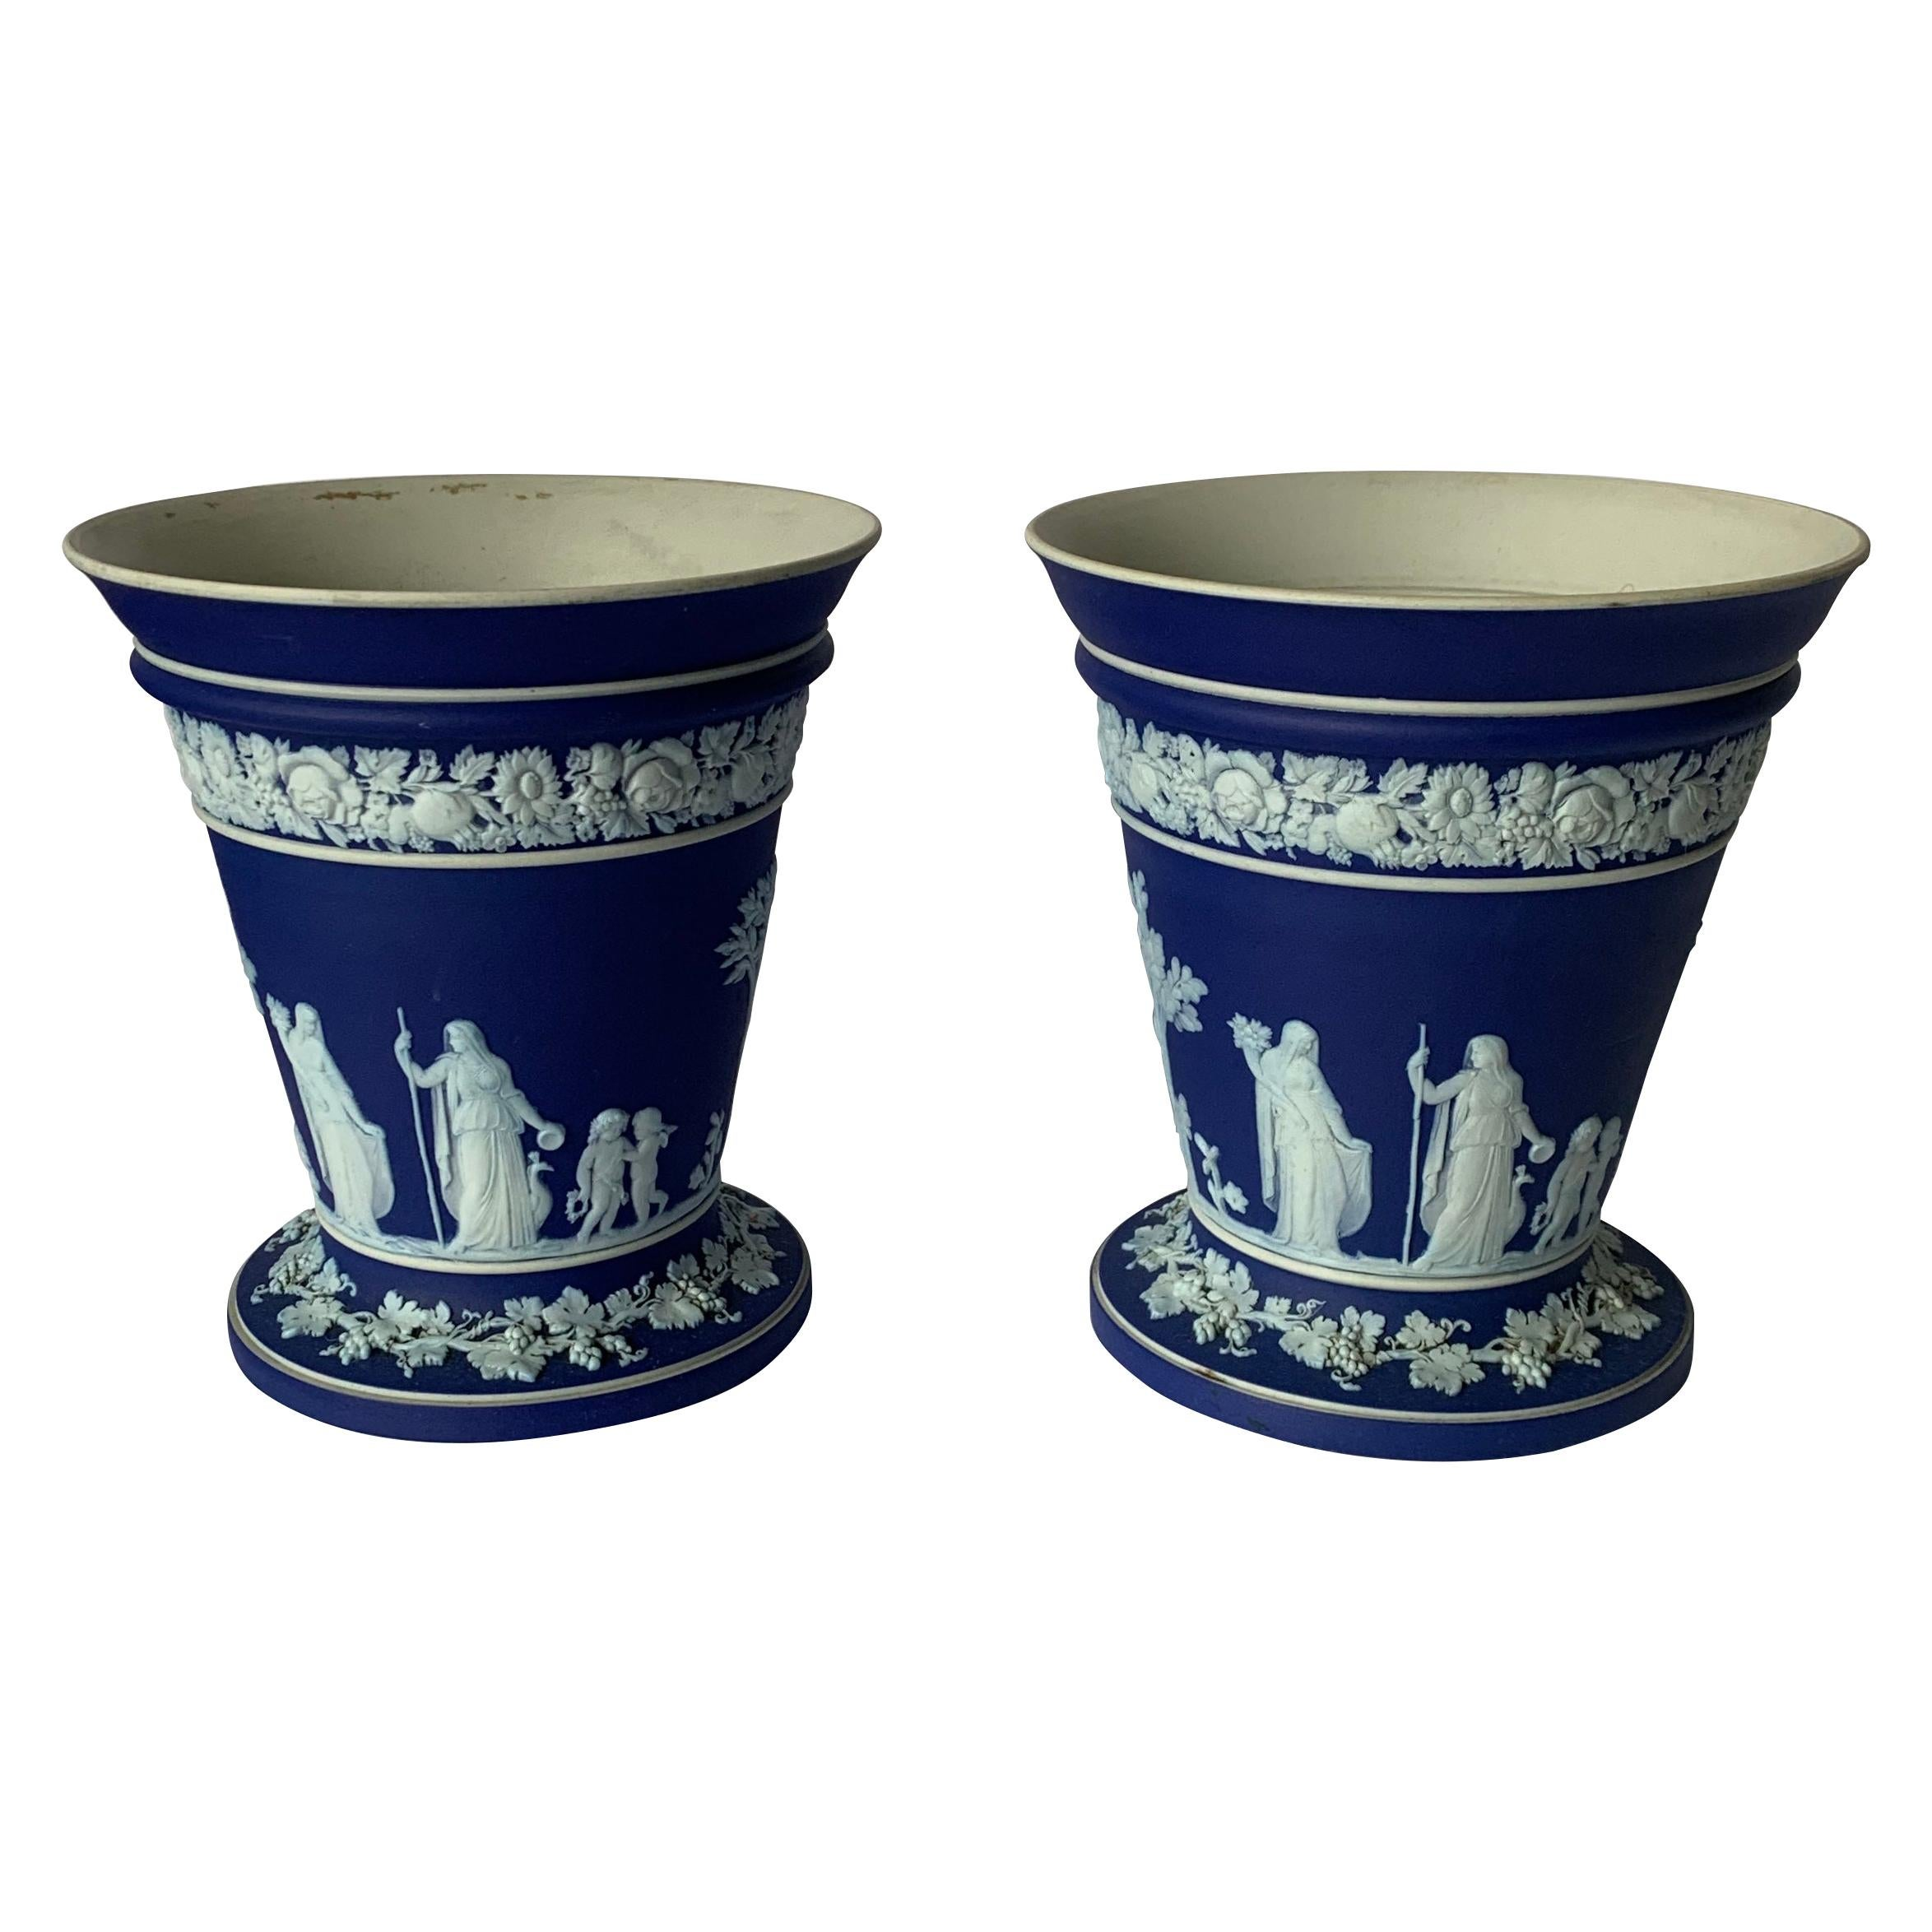 Pair of Wedgwood Dark Blue and White Vases